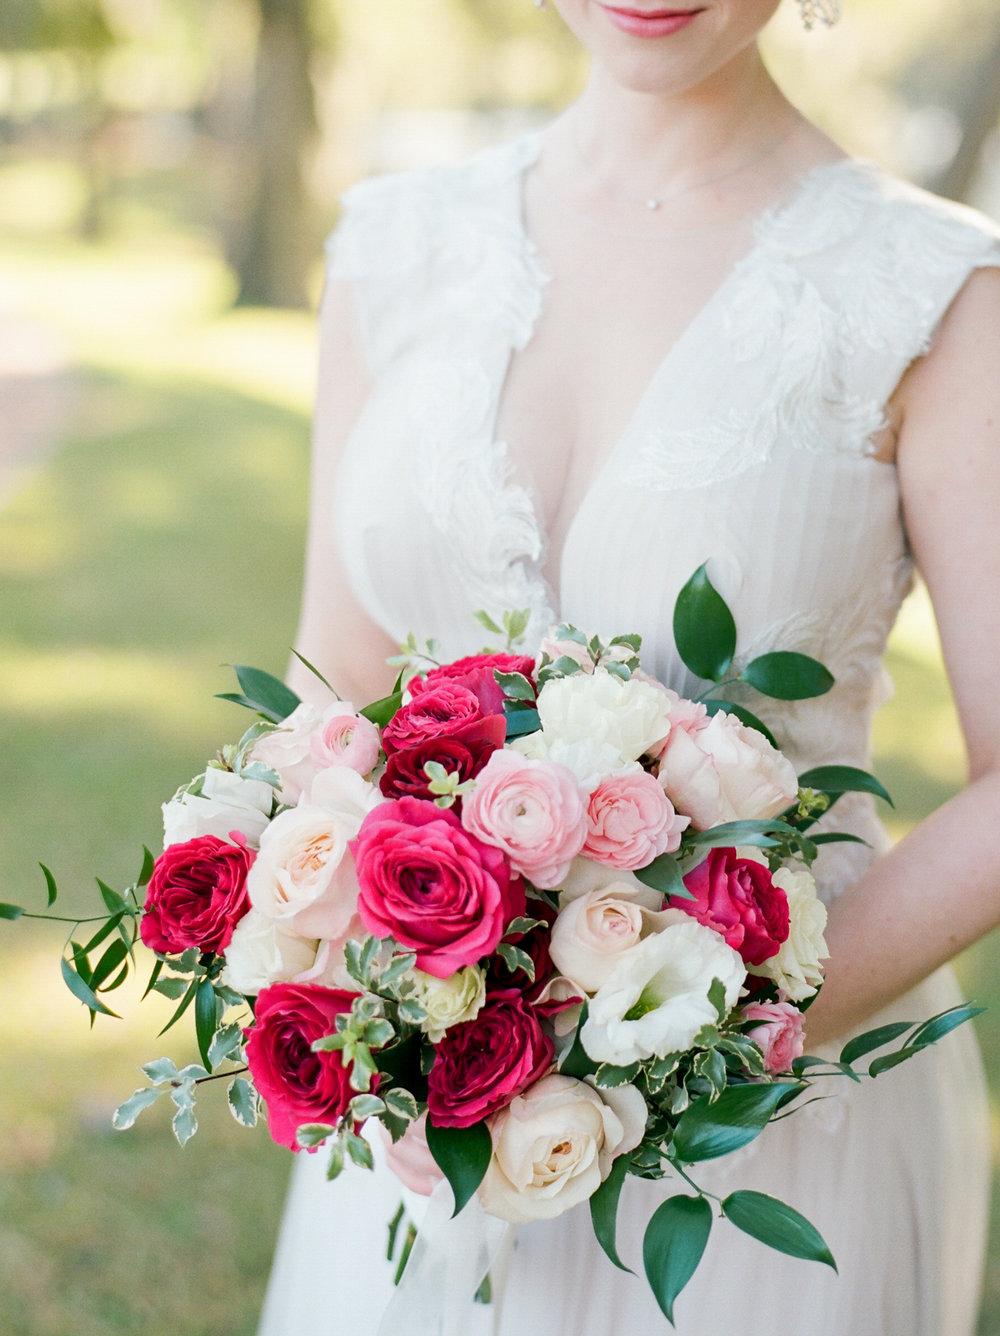 Houston-Wedding-Photographer-Lakeside-Country-Club-First-Look-Bride-Groom-Formals-Film-Fine-Art-Photography-15.jpg